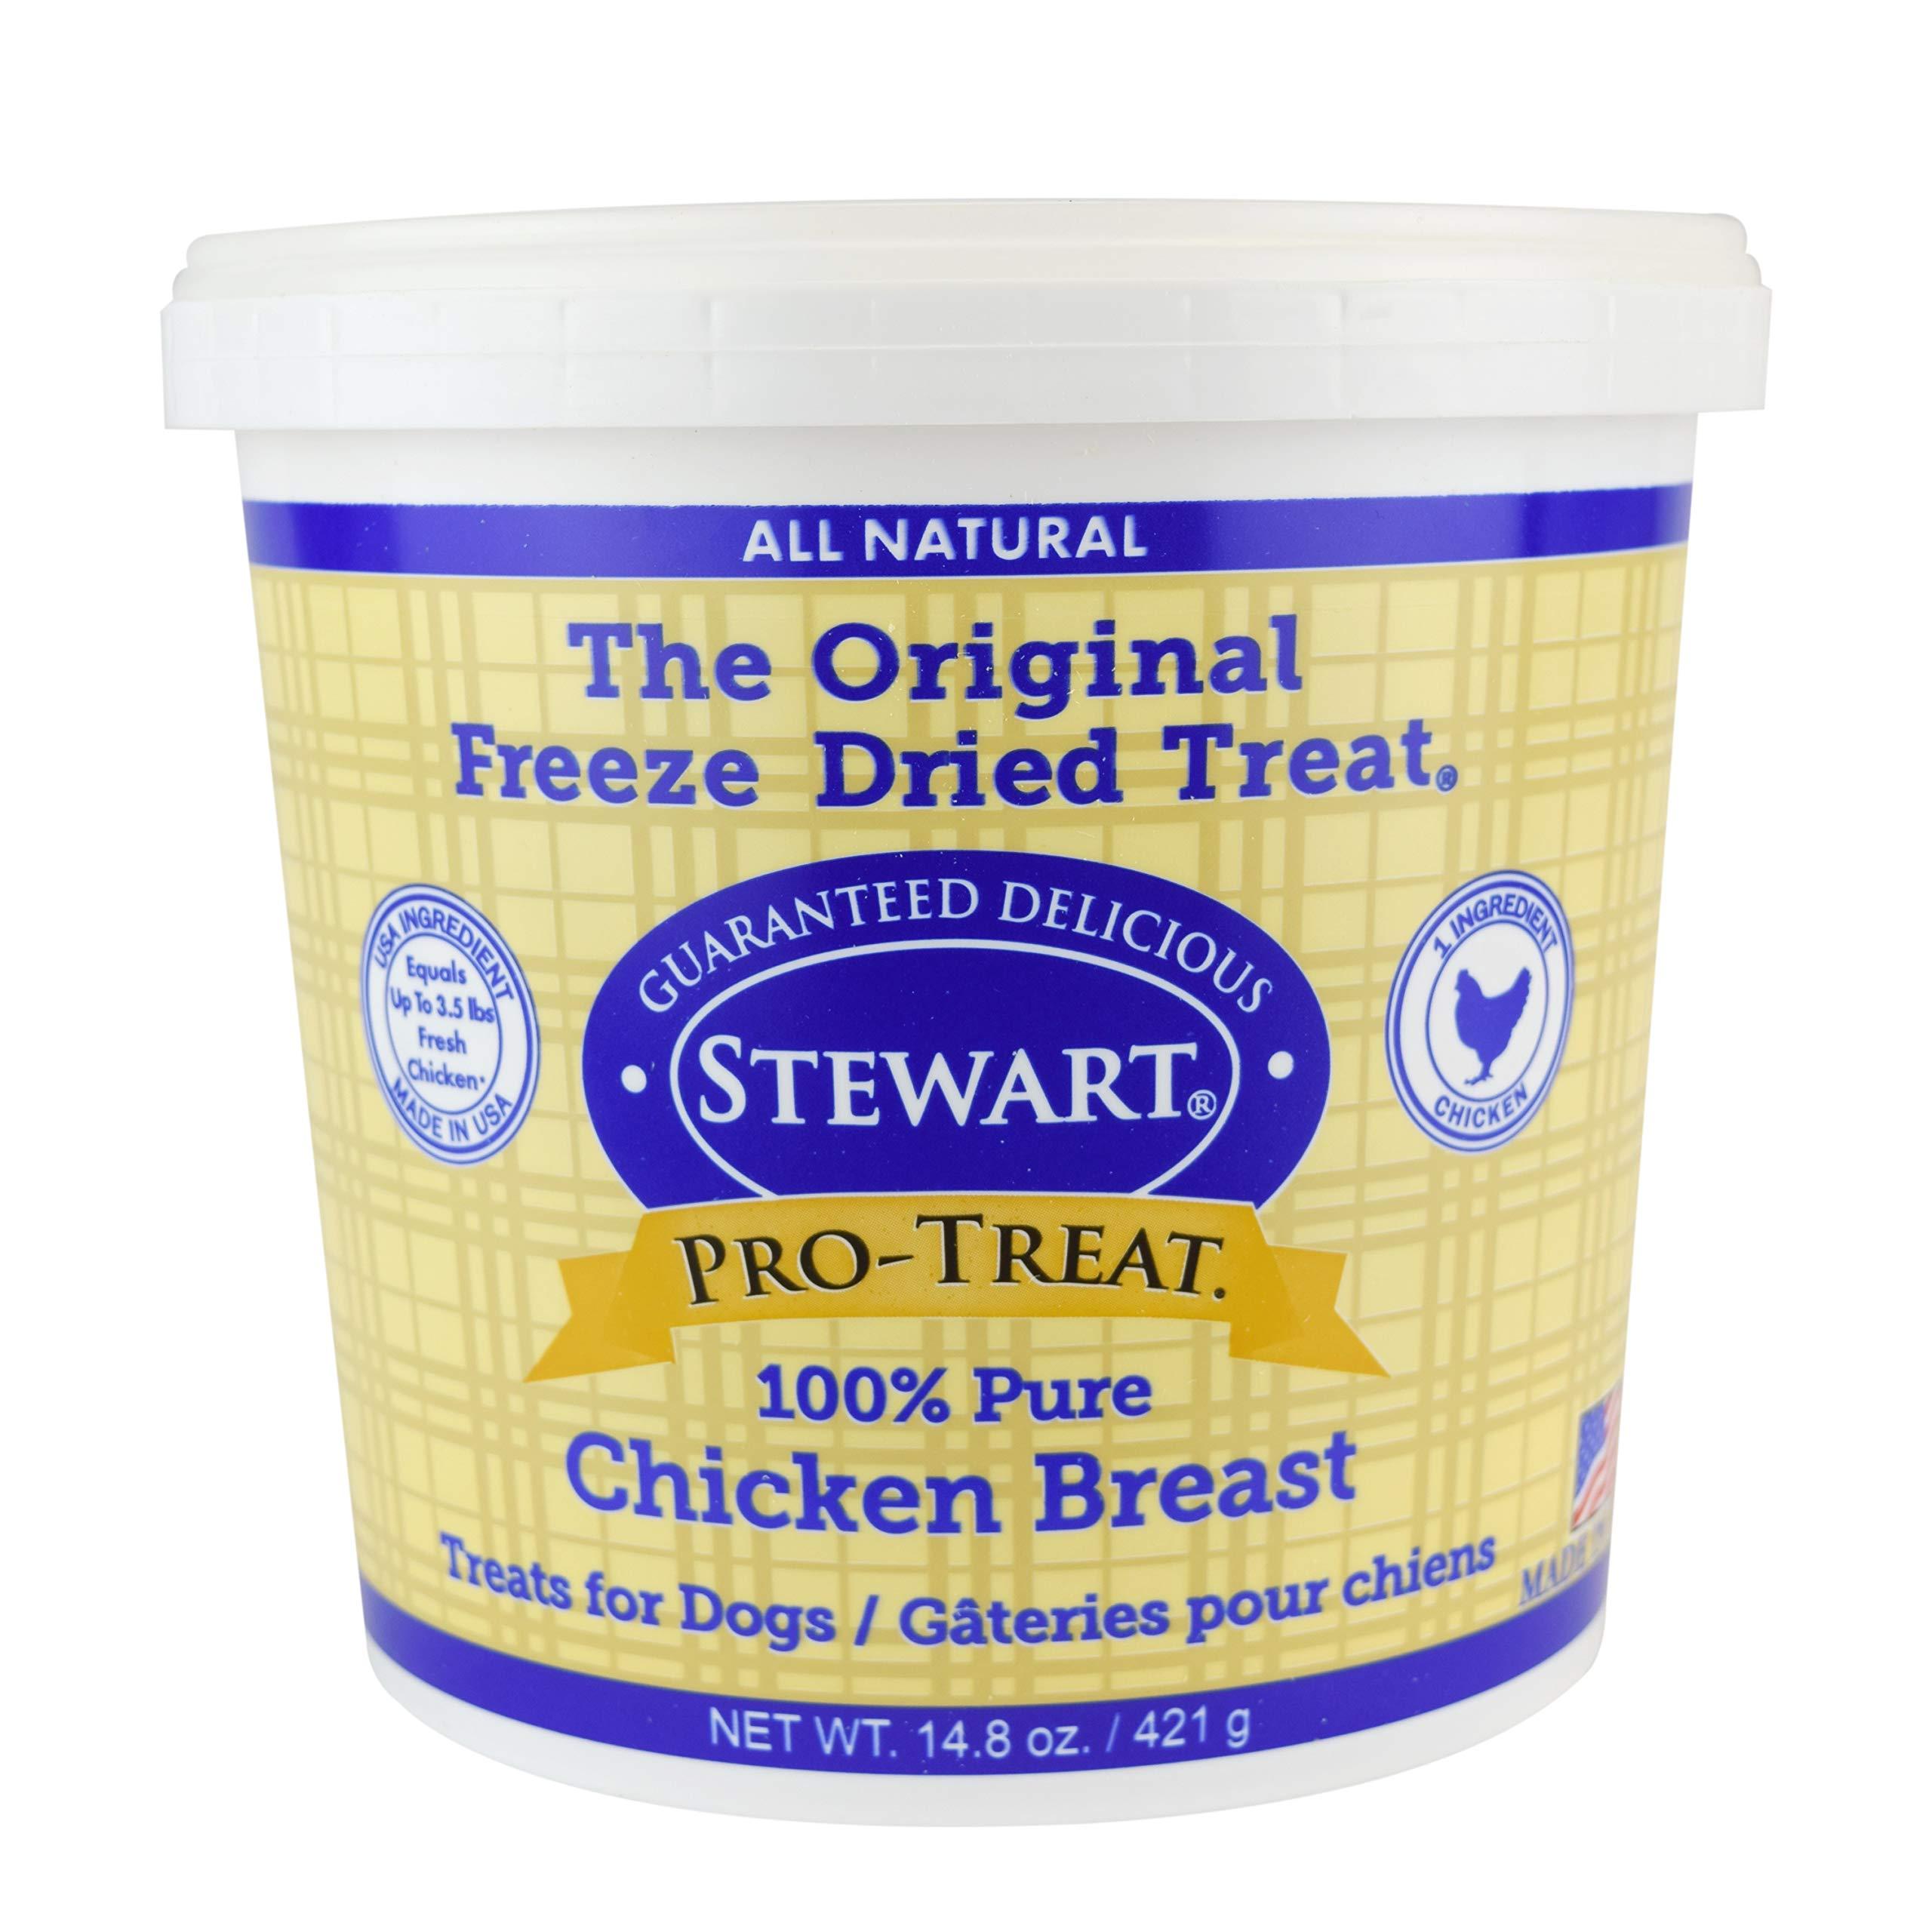 Stewart Pro-Treat, Freeze Dried Chicken Breast Dog Treats, Single Ingredient, Grain Free, USA Made, 14.8 oz. Resealable Tub